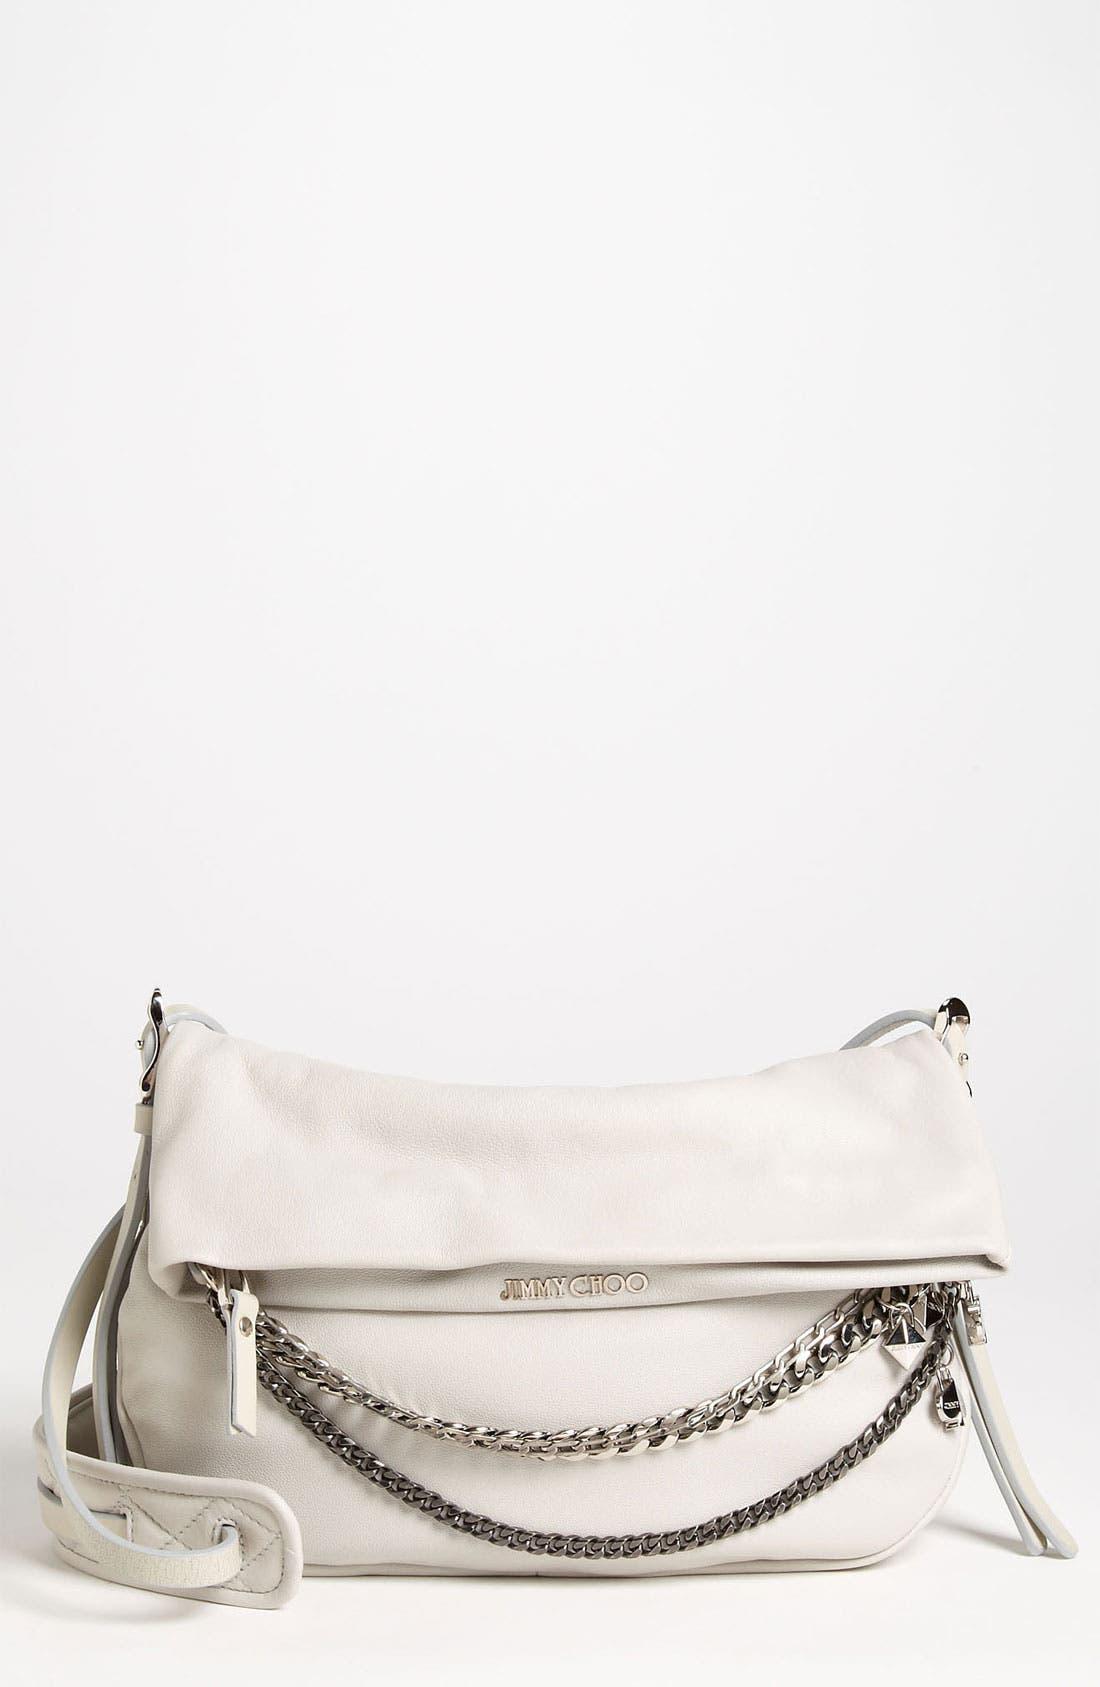 Main Image - Jimmy Choo 'Biker - Small' Leather Crossbody Bag